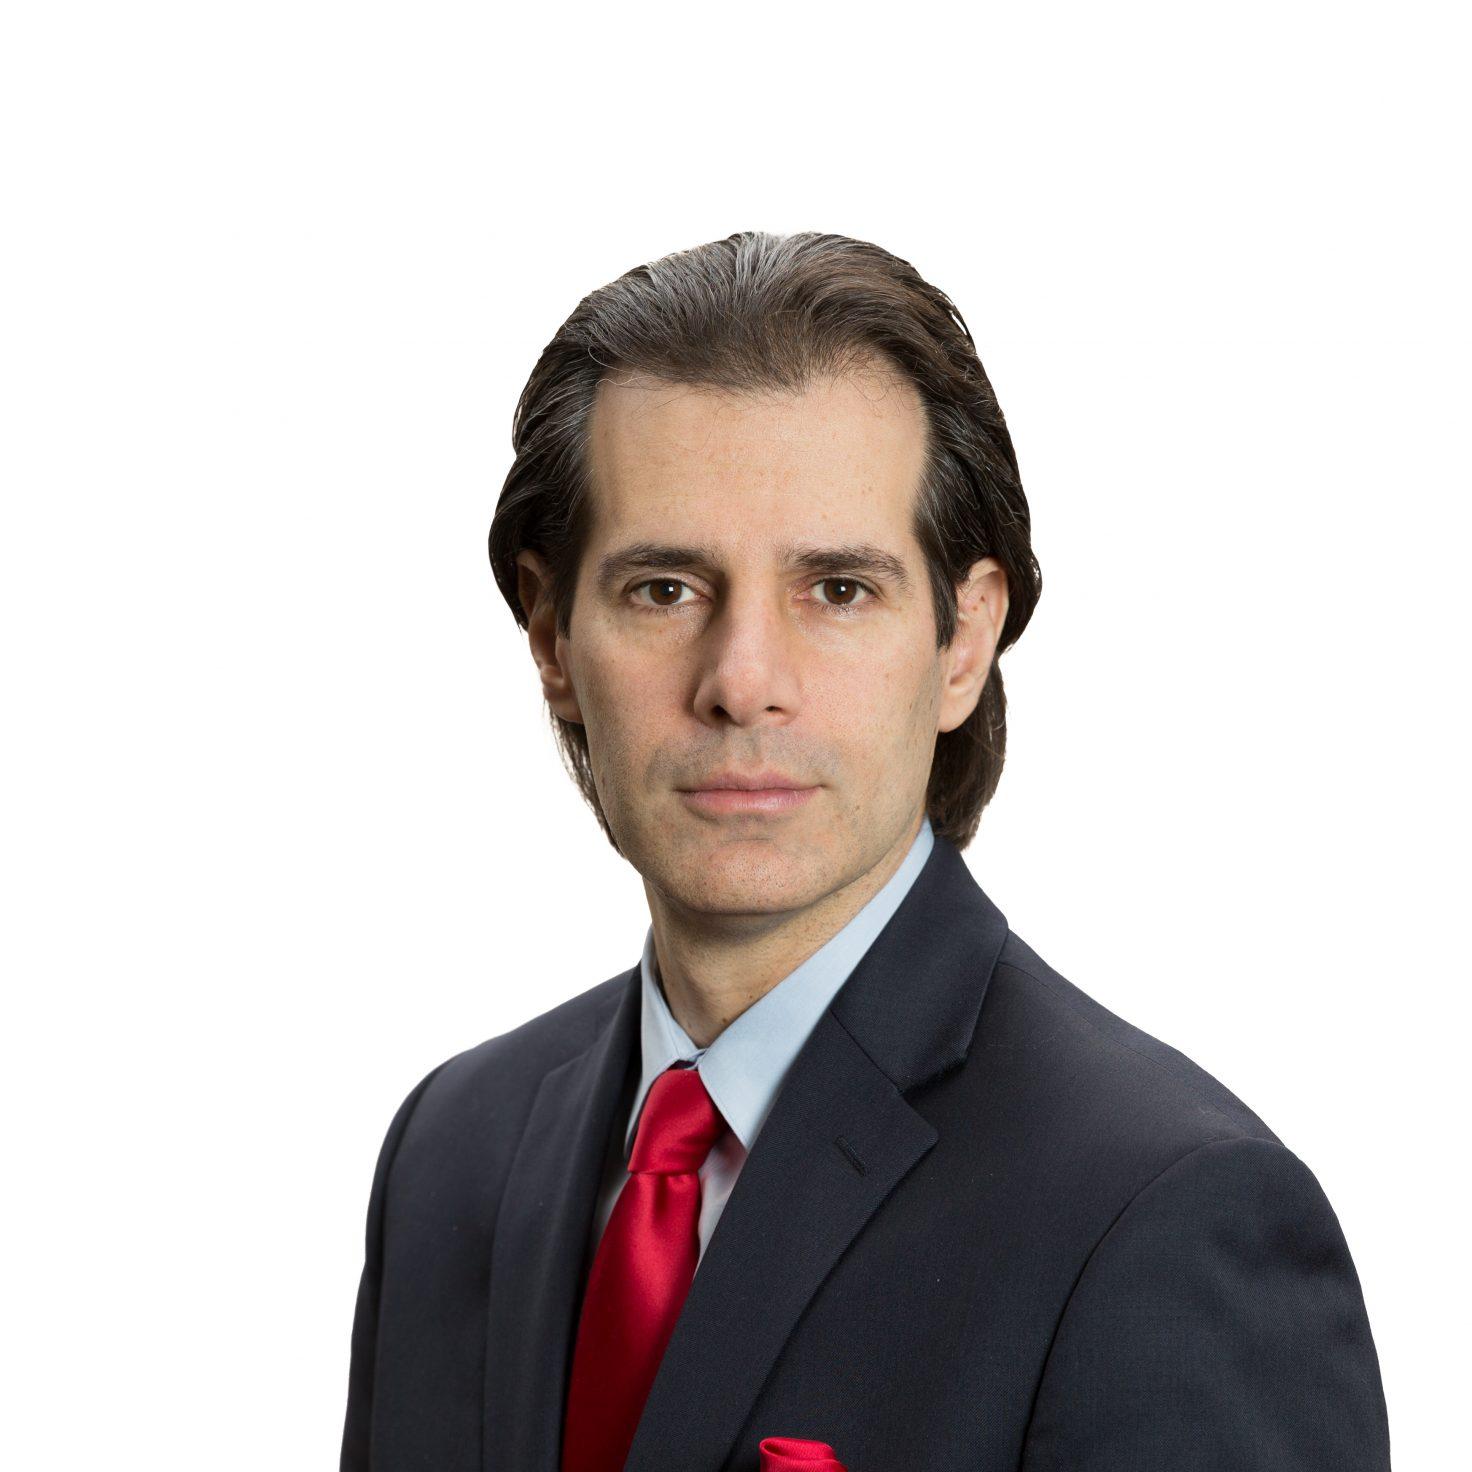 Paul G. Paravati, Esq.